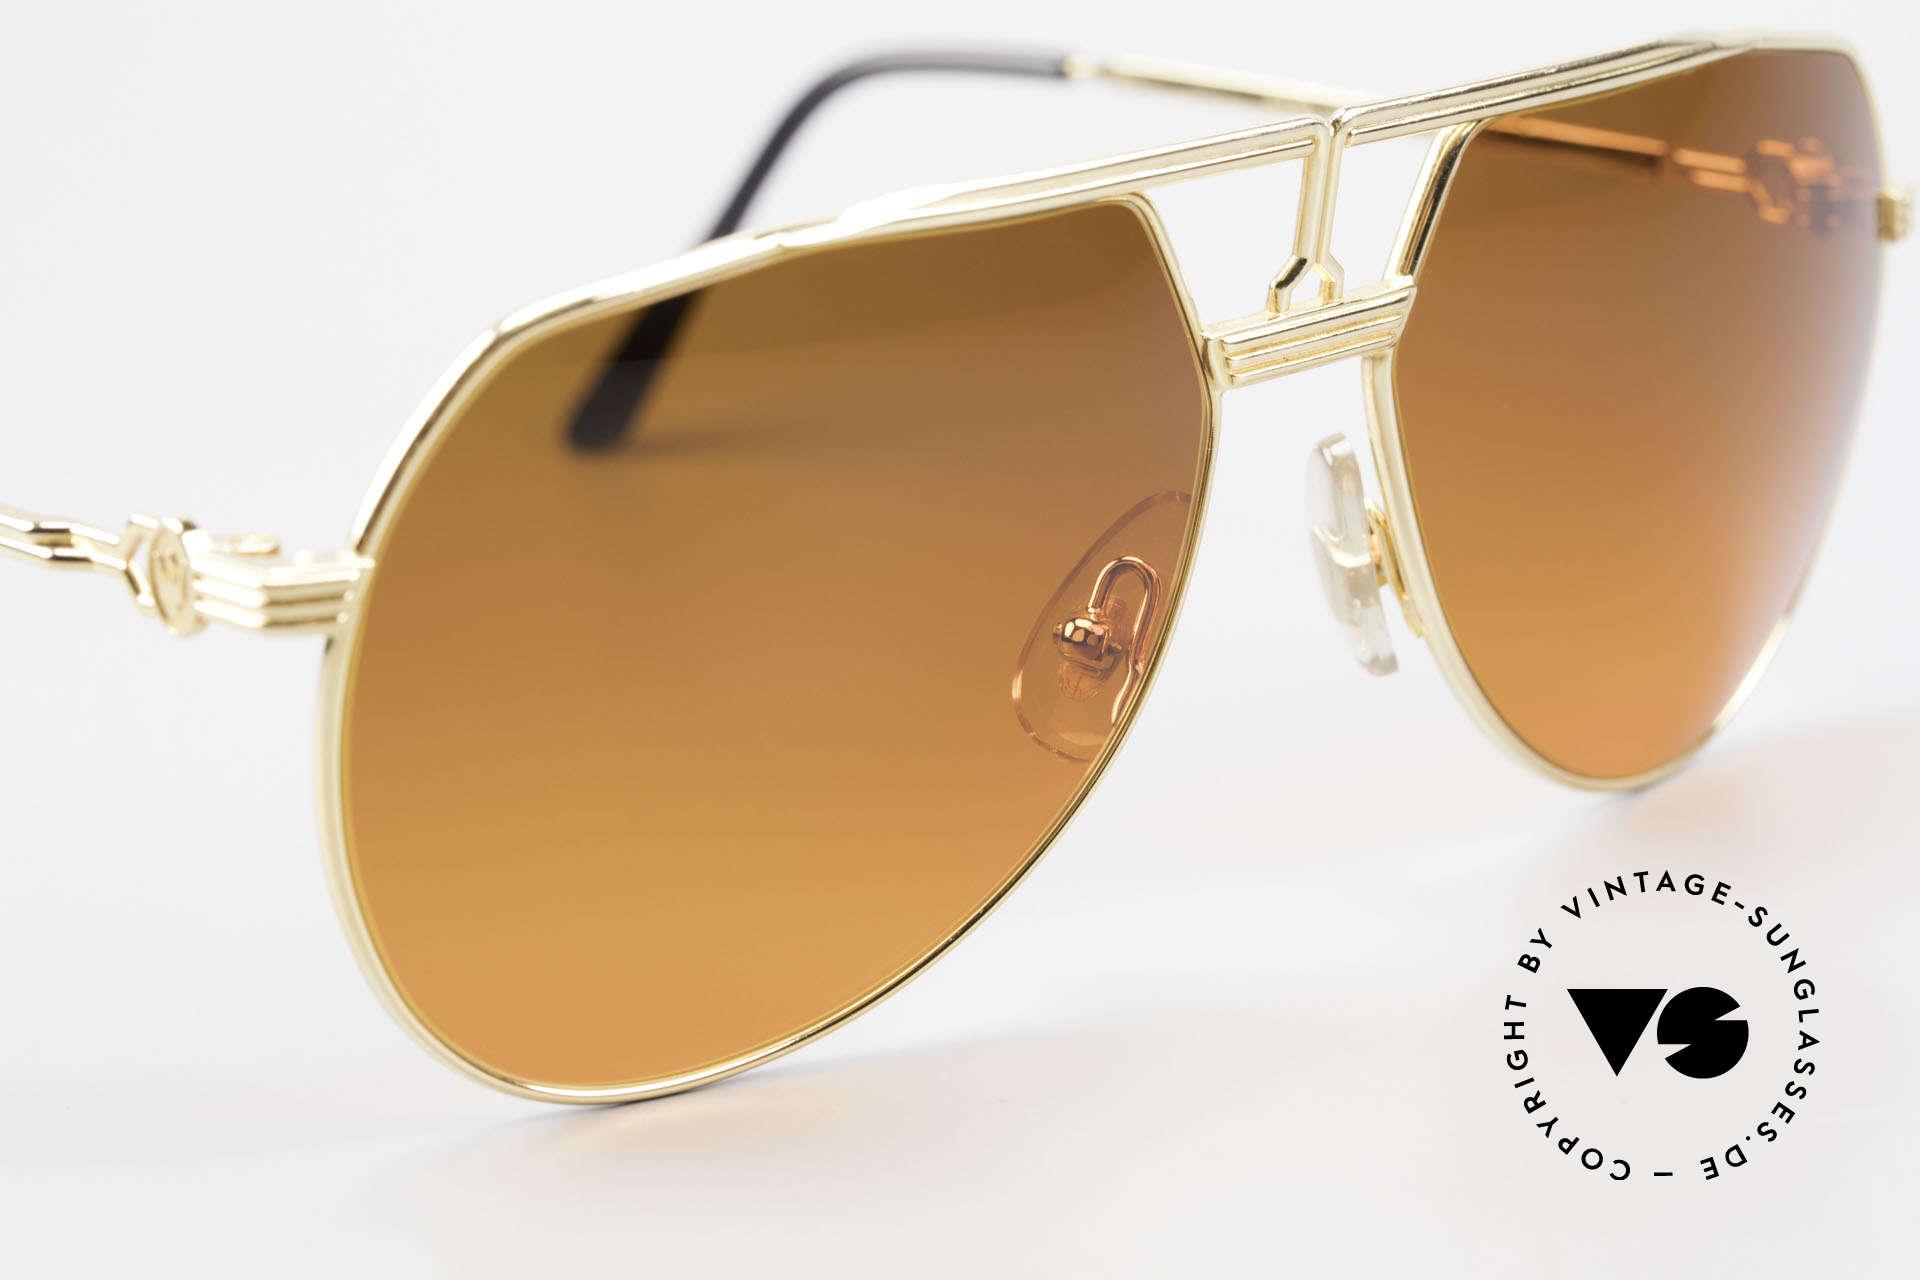 Maserati 6130 Luxury Aviator Sunglasses 80's, unworn; like all our rare vintage 80s Maserati sunglasses, Made for Men